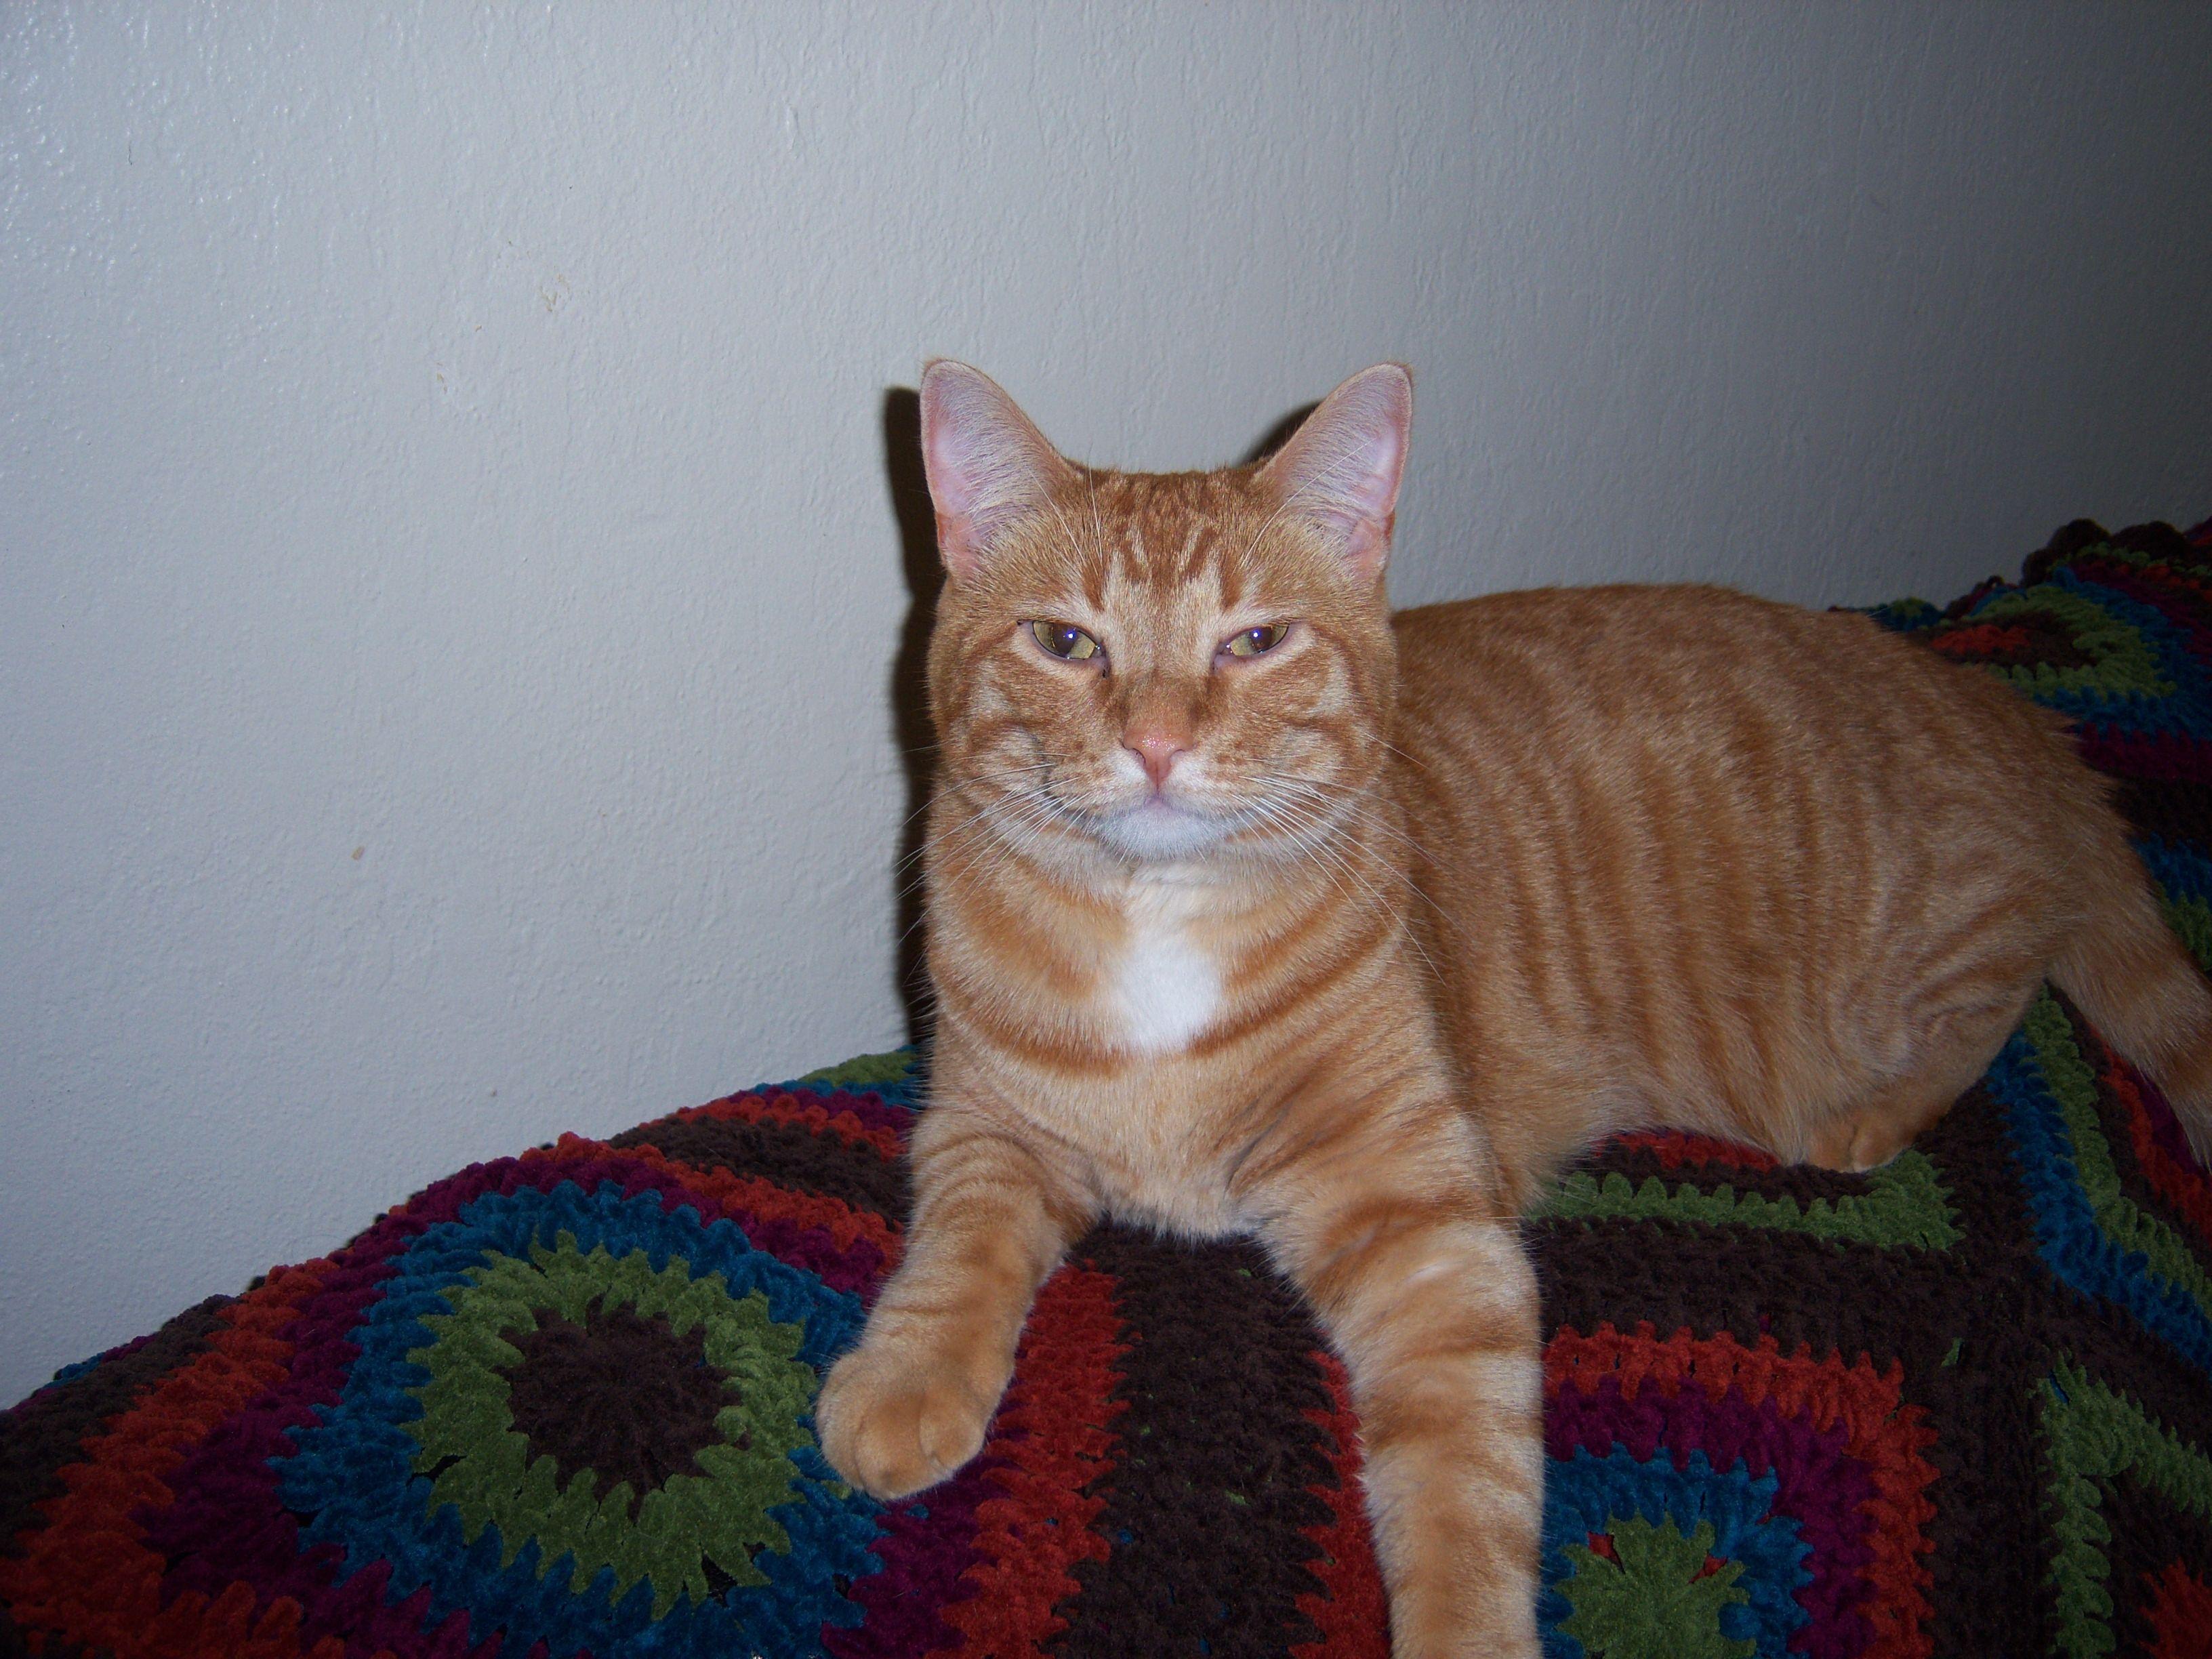 LOST CAT! Southern Idaho. Neutered male orange tabby